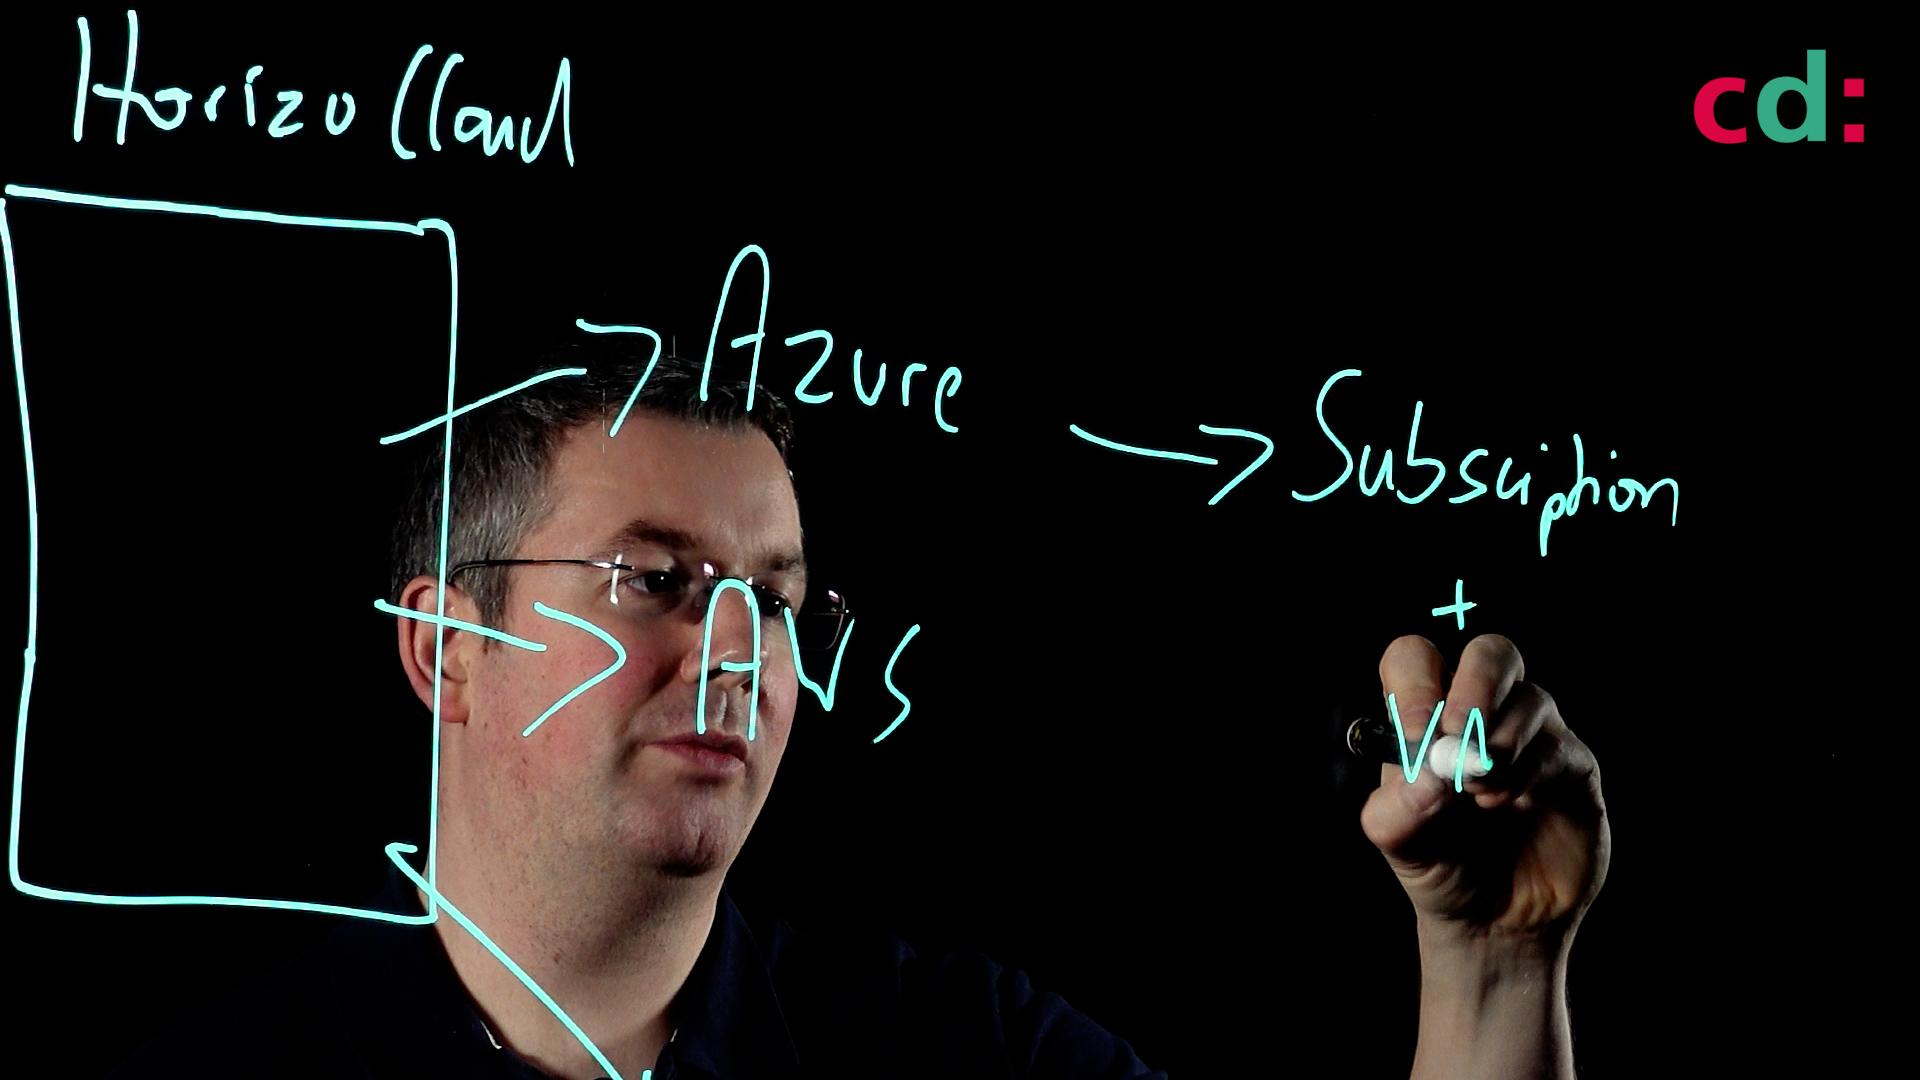 Horizon Cloud VDI Lightboard